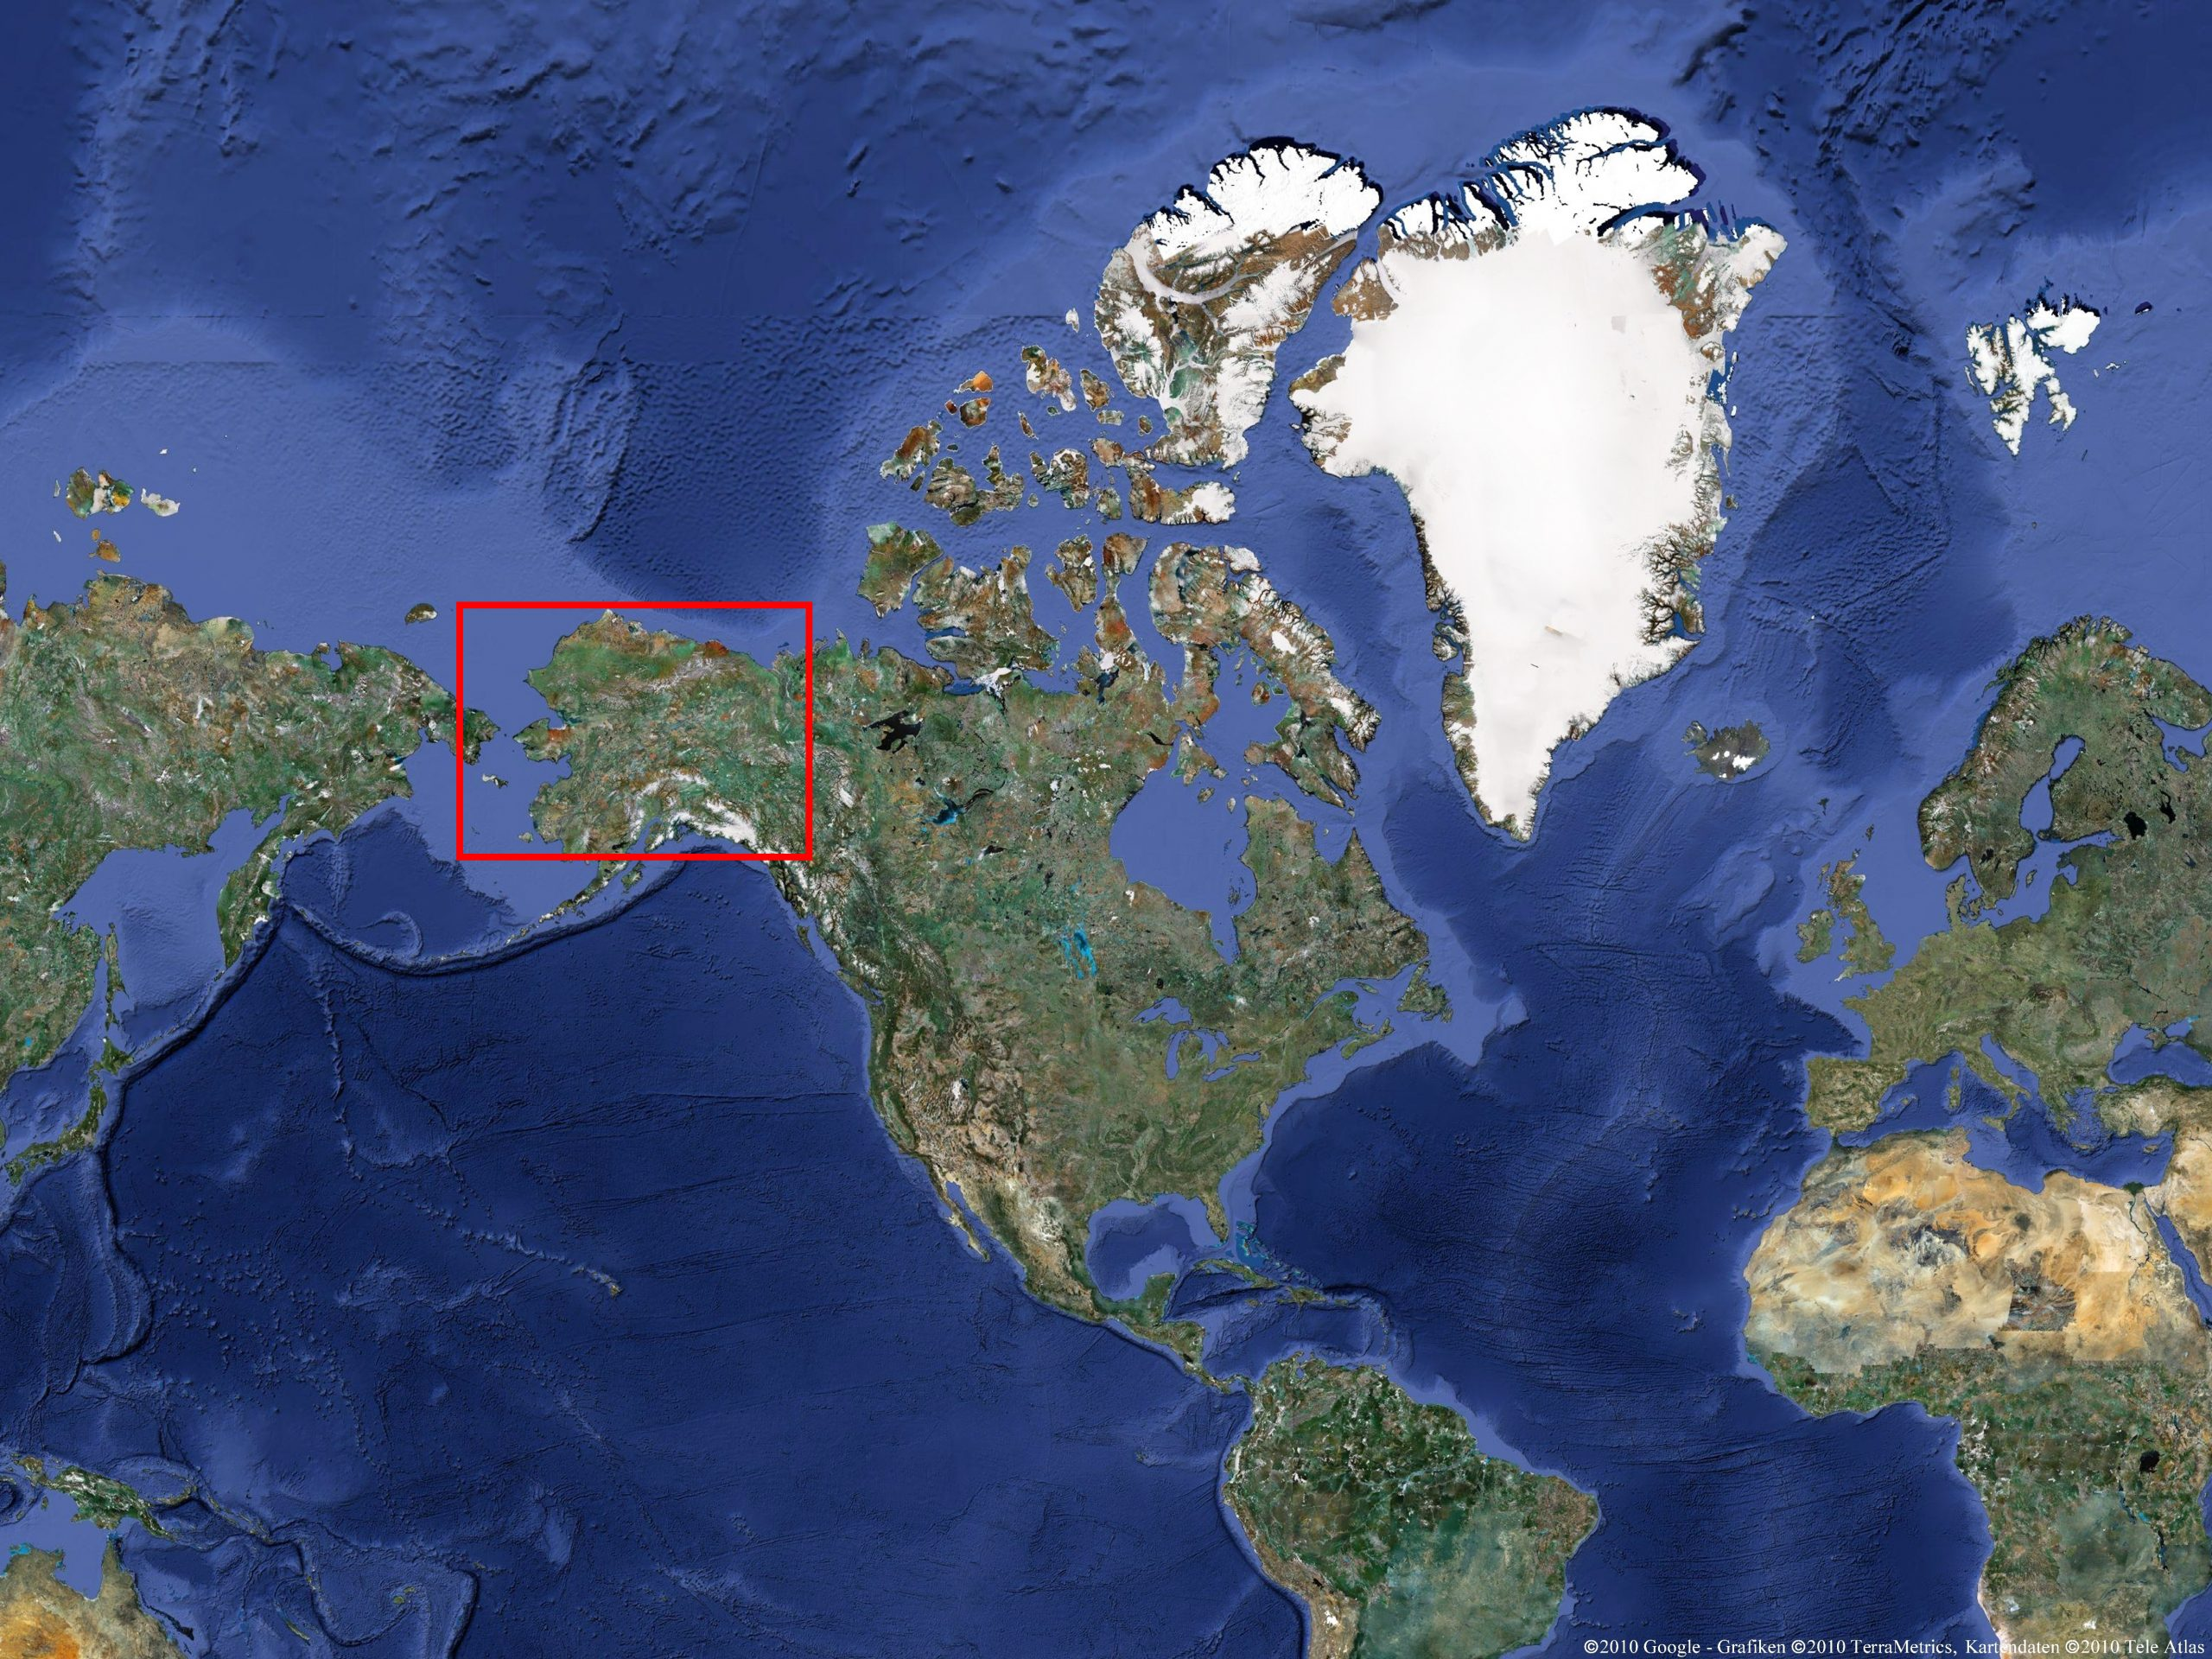 Radreise Alaska 2010 - Weltkarte